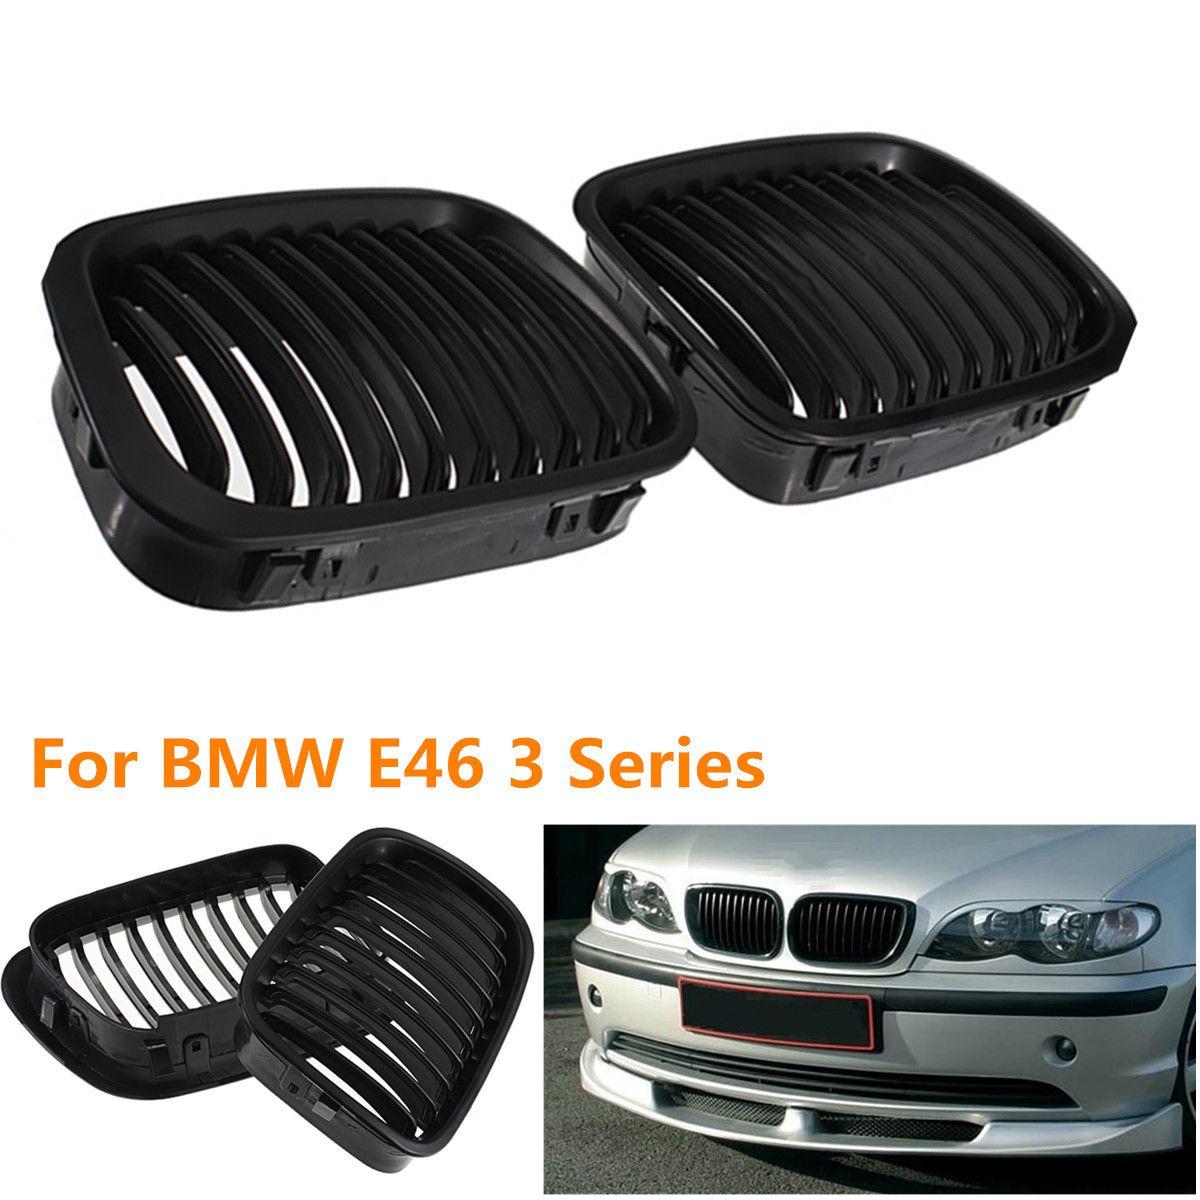 101cf5723e5 BLACK Car GRILLE GRILL For BMW E46 1998 2001 4 DOOR 320i 323i 325i 328i  330i 1998 2001 Custom Car Exterior Accessories Custom Car Lights Exterior  From ...